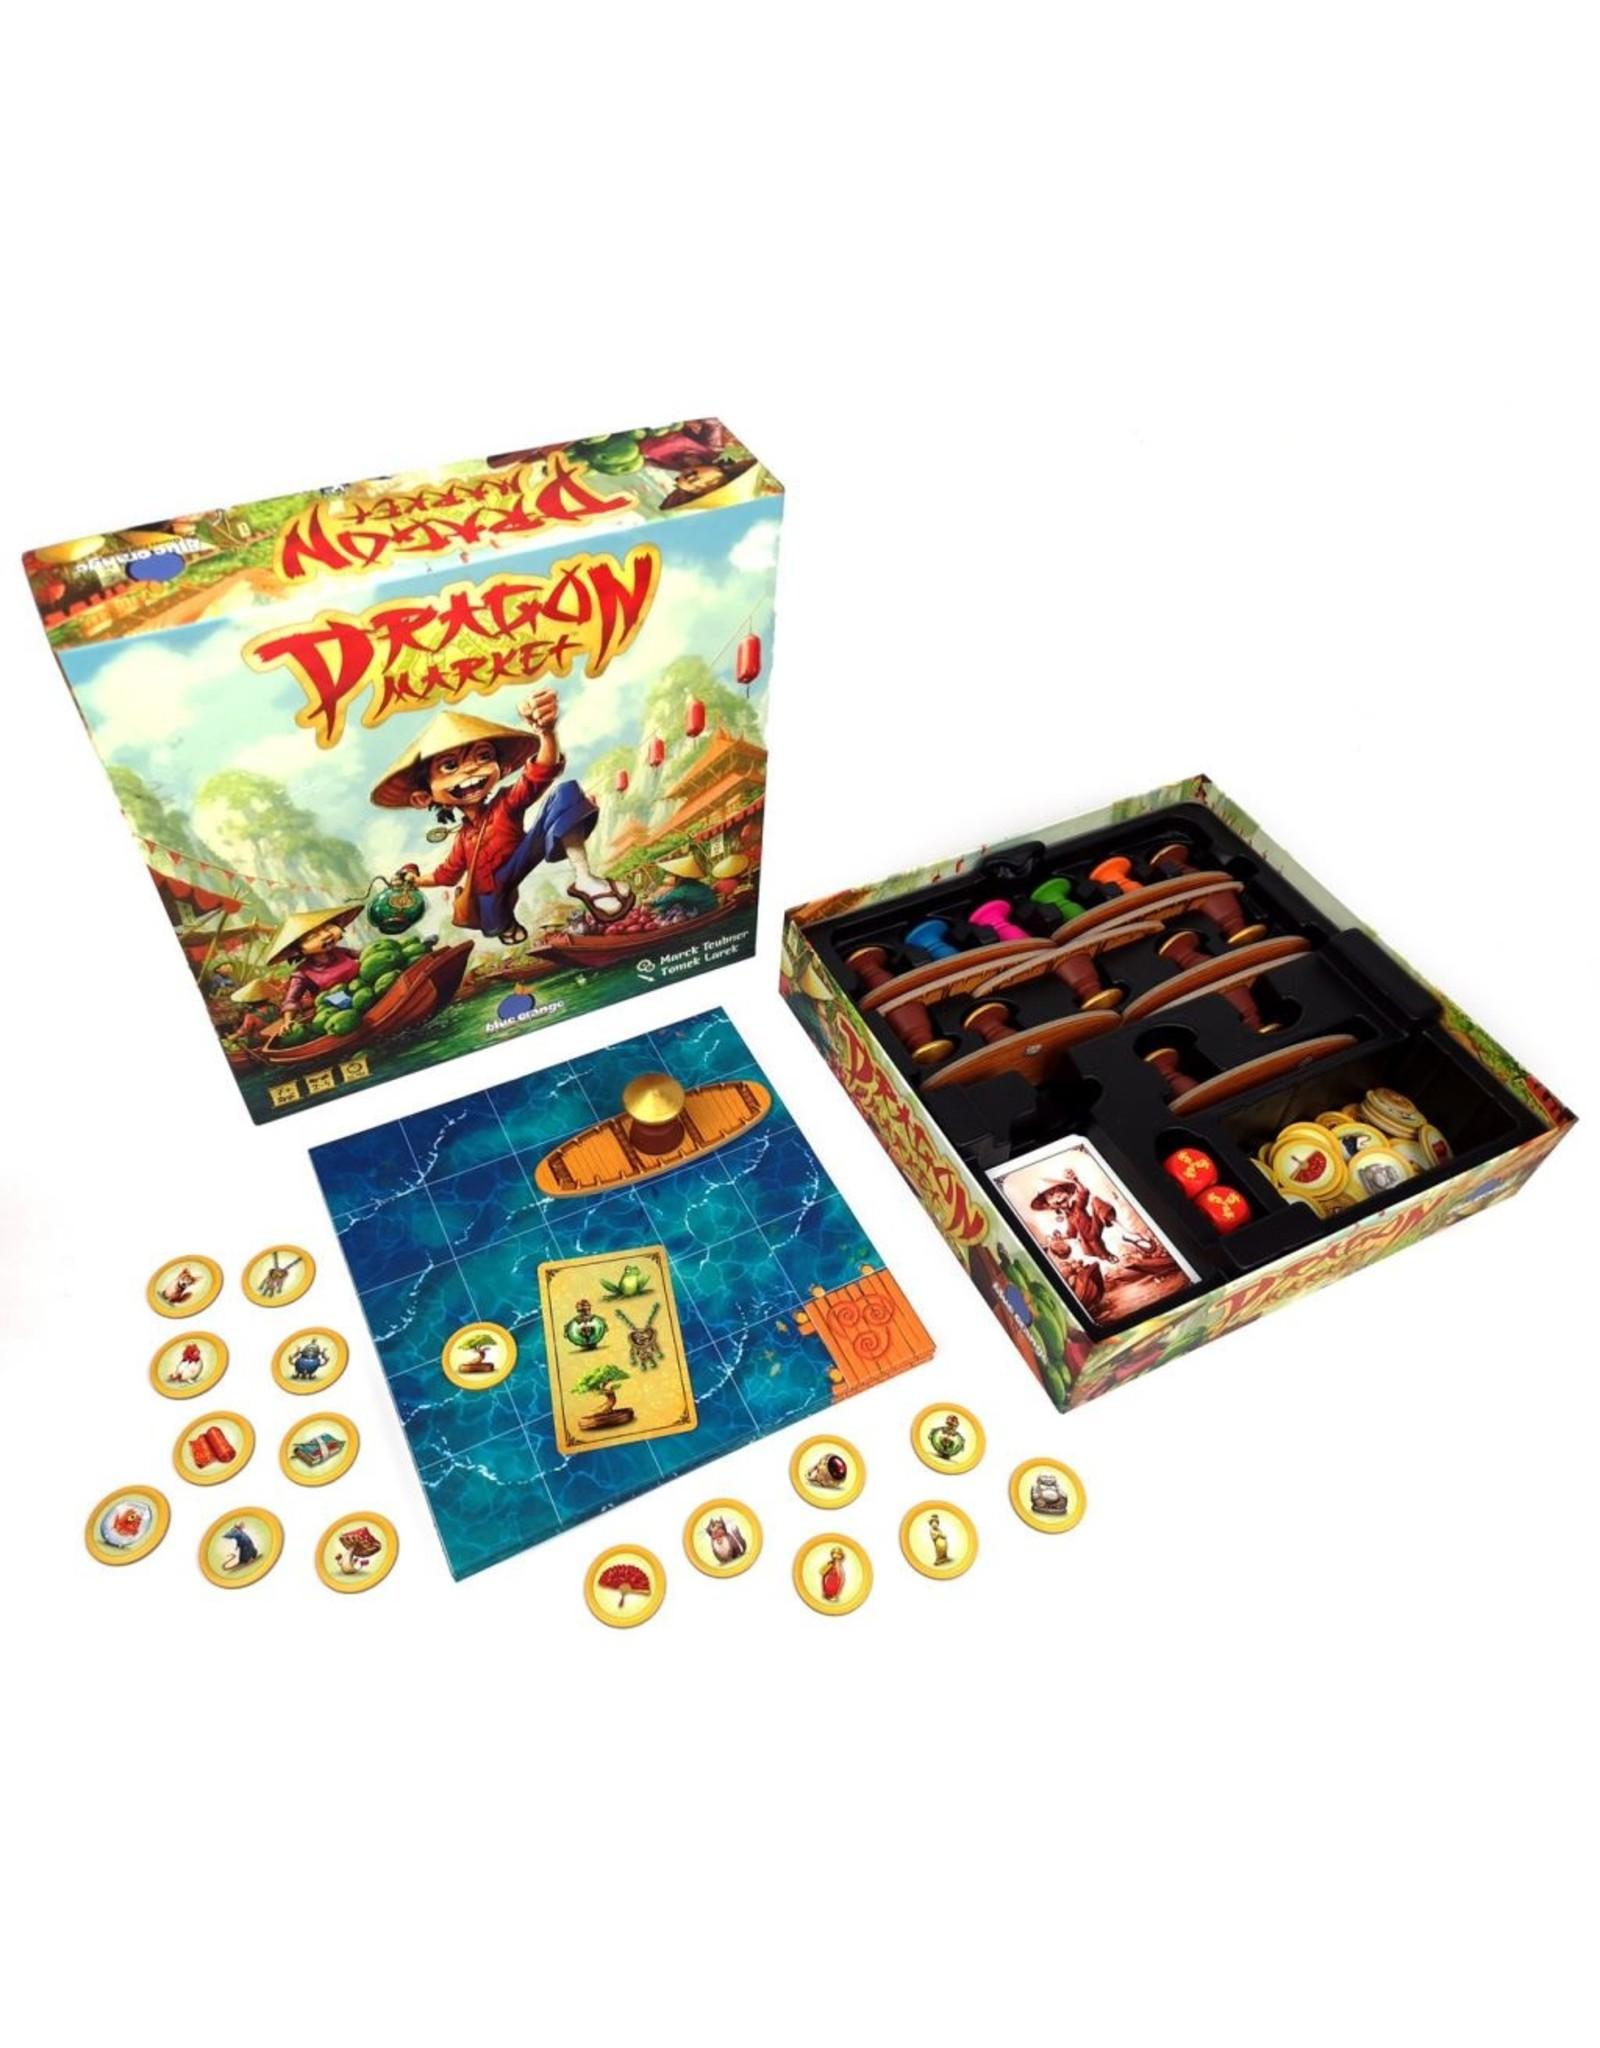 Blue Orange Games Dragon Market